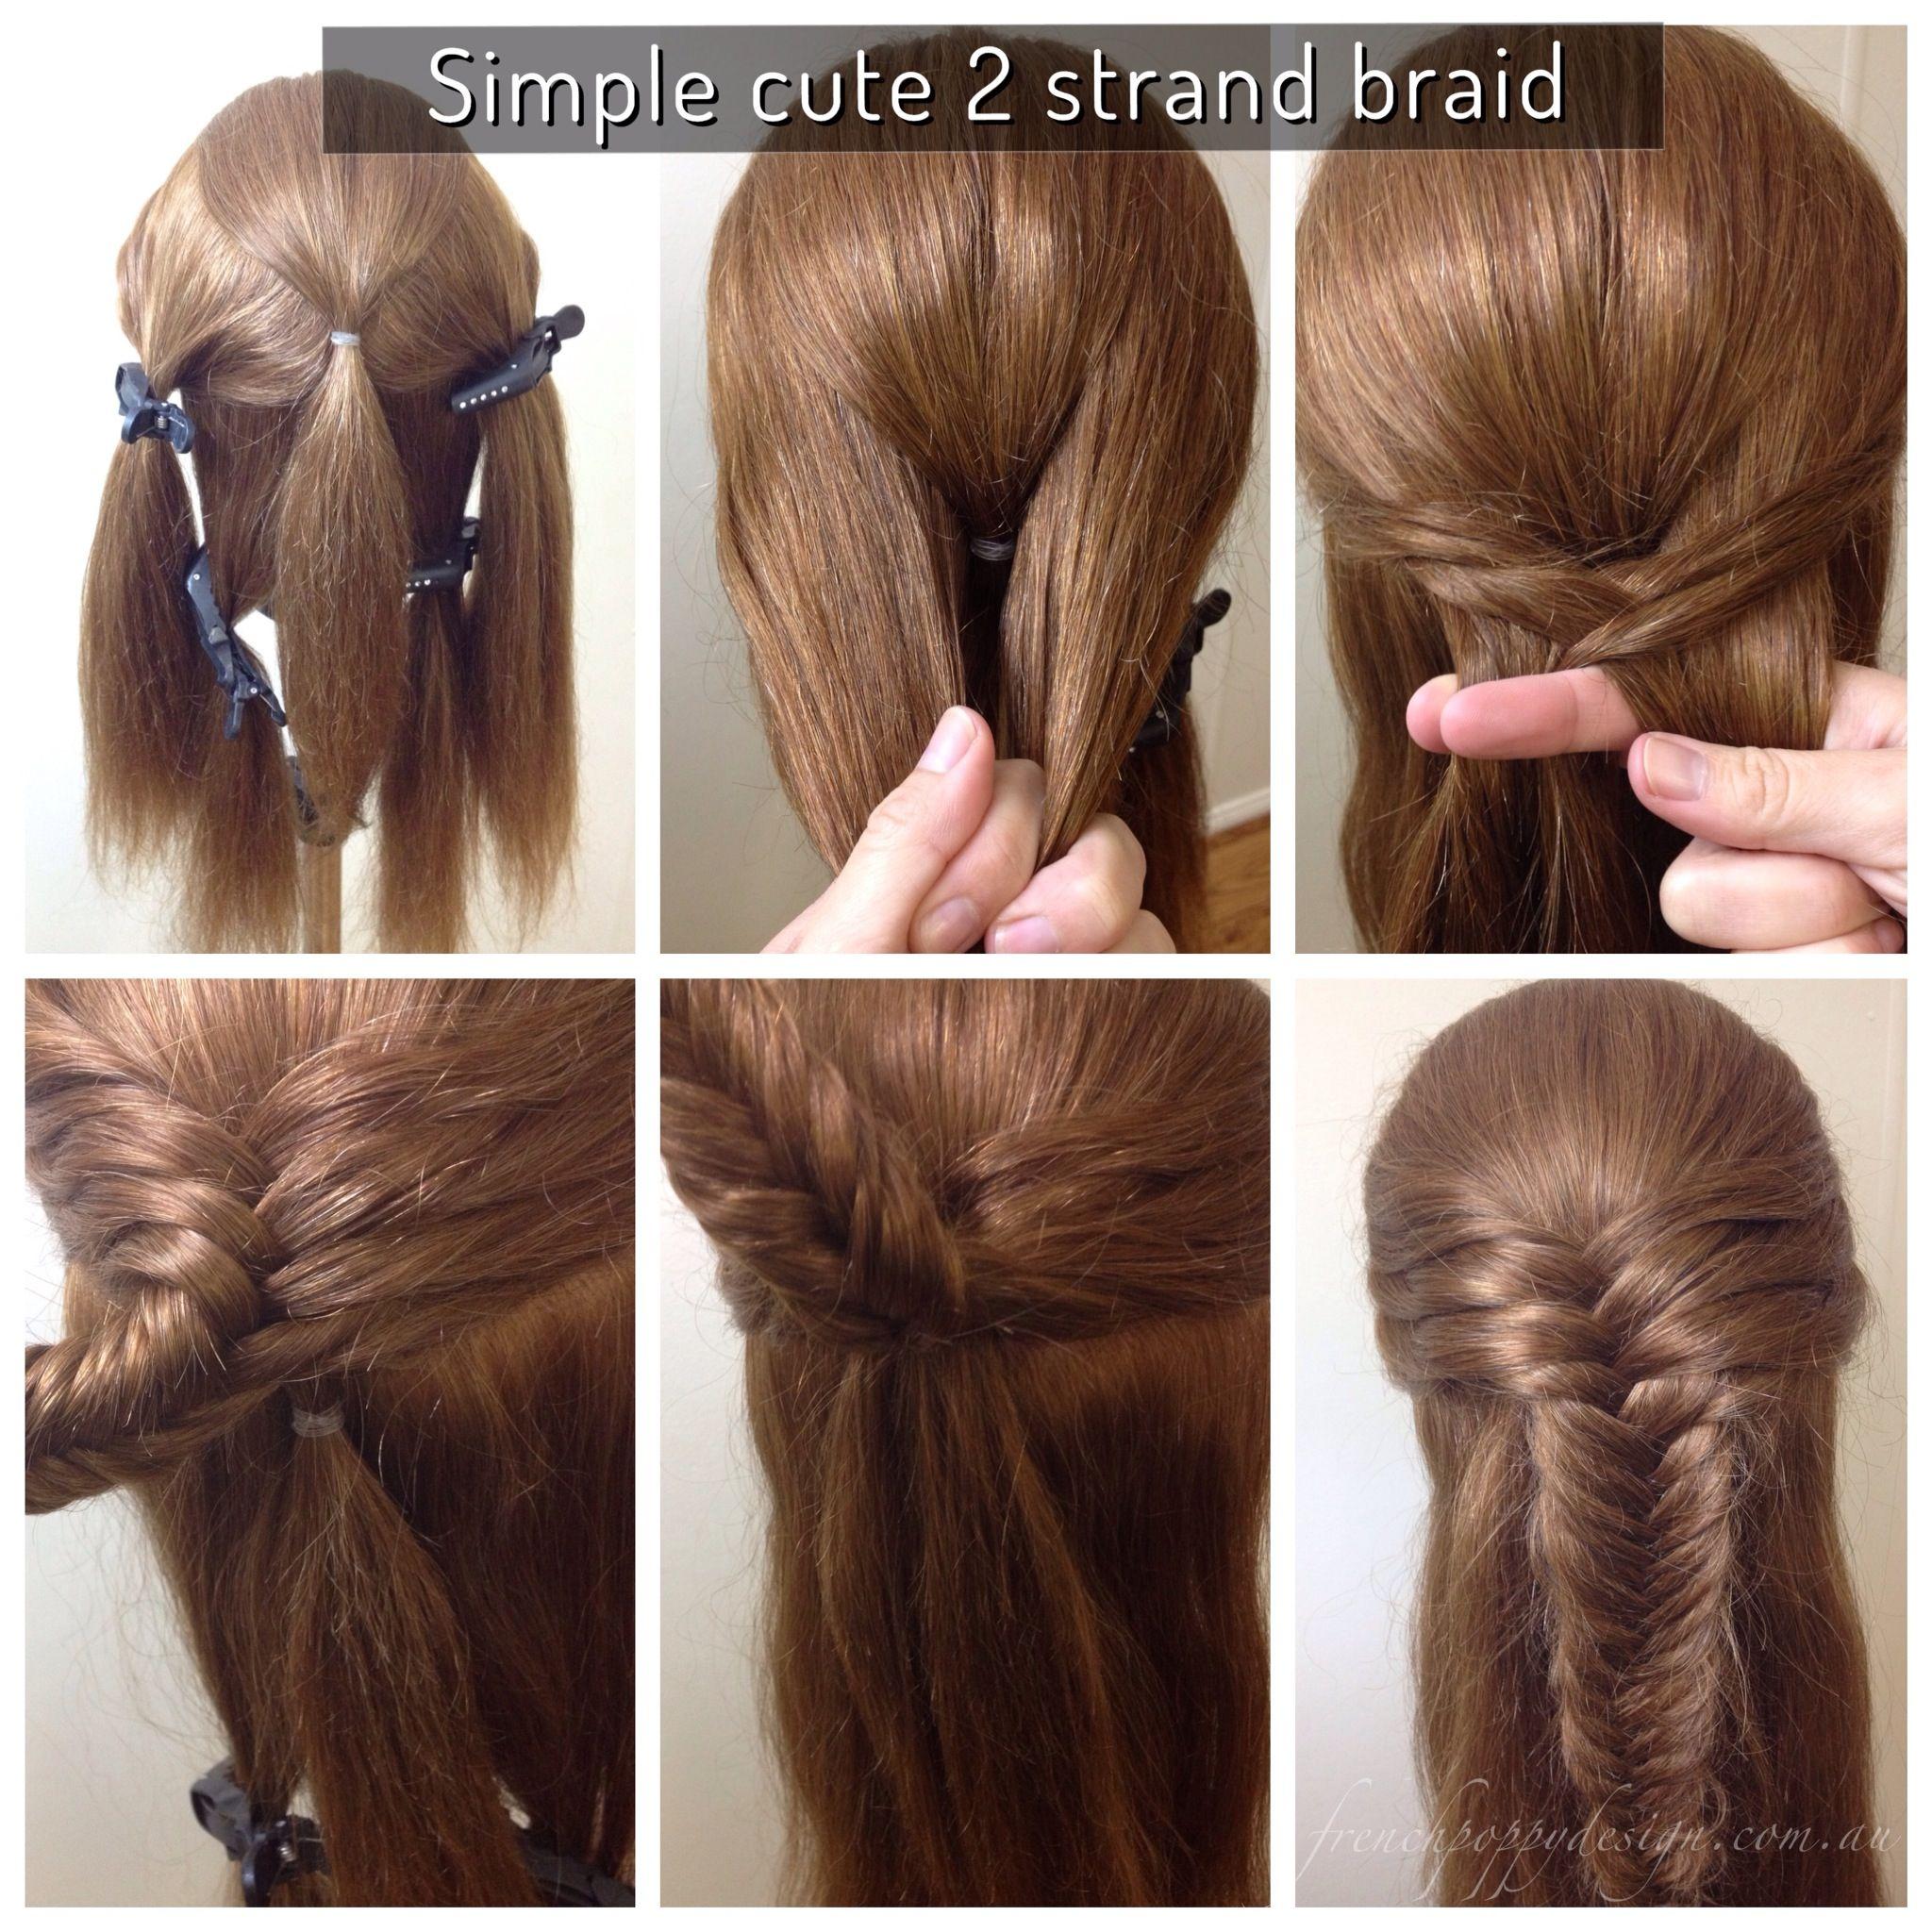 Cute And Easy Hair Design Created By French Poppy Design W Frenchpoppydesign Com Au Hair Styles Jasmine Hair Long Hair Styles